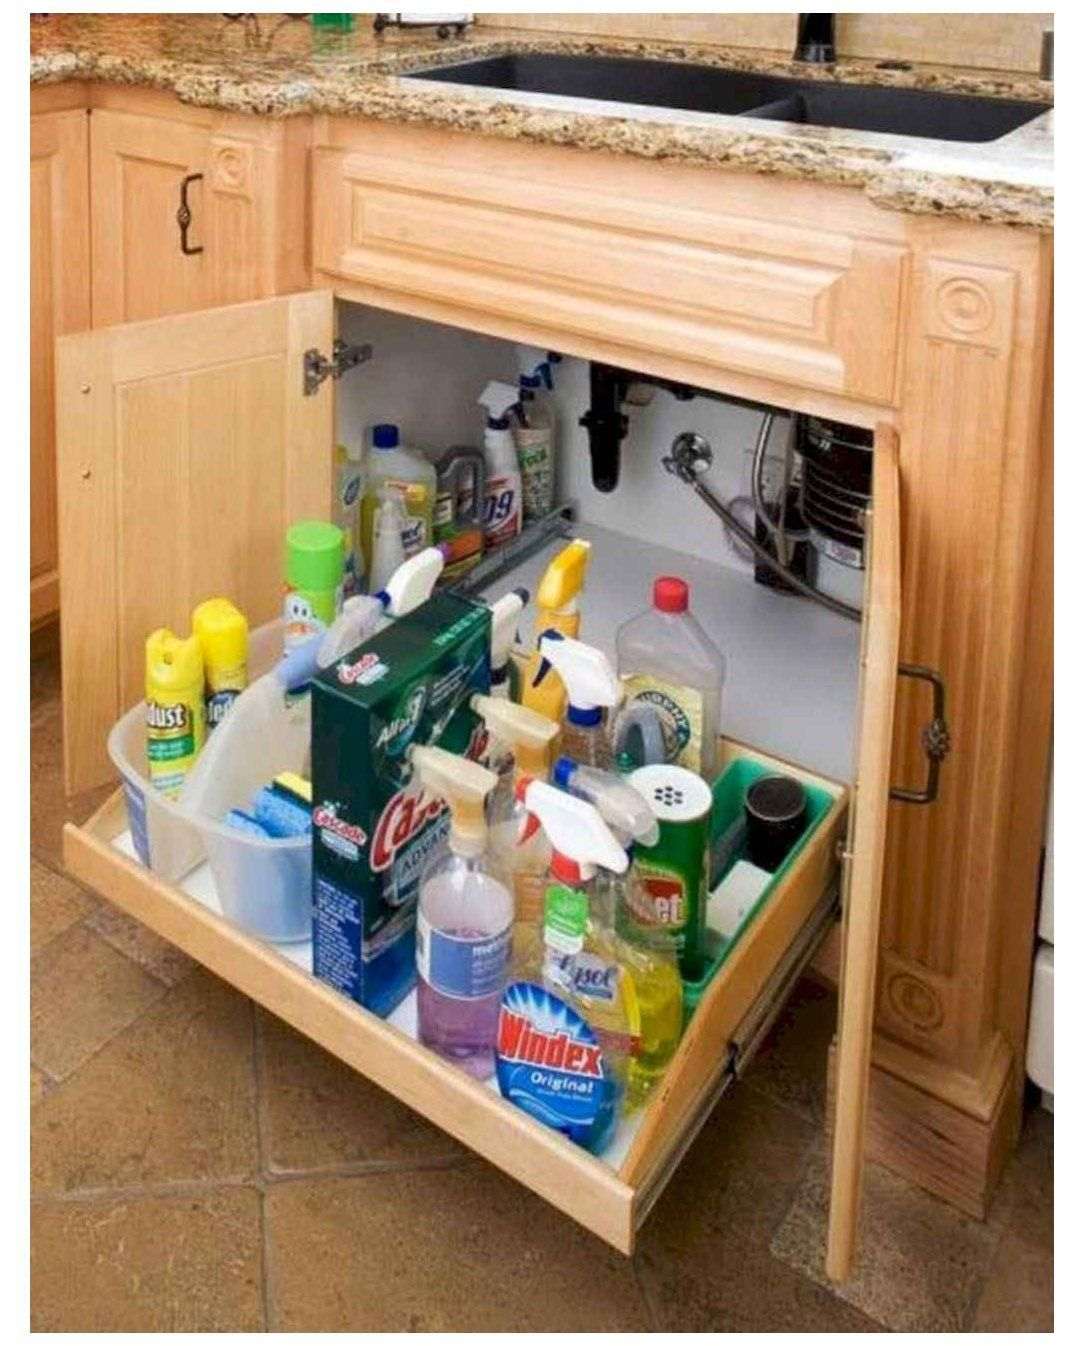 65 brilliant kitchen cabinet organization and tips ideas on brilliant kitchen cabinet organization id=45035